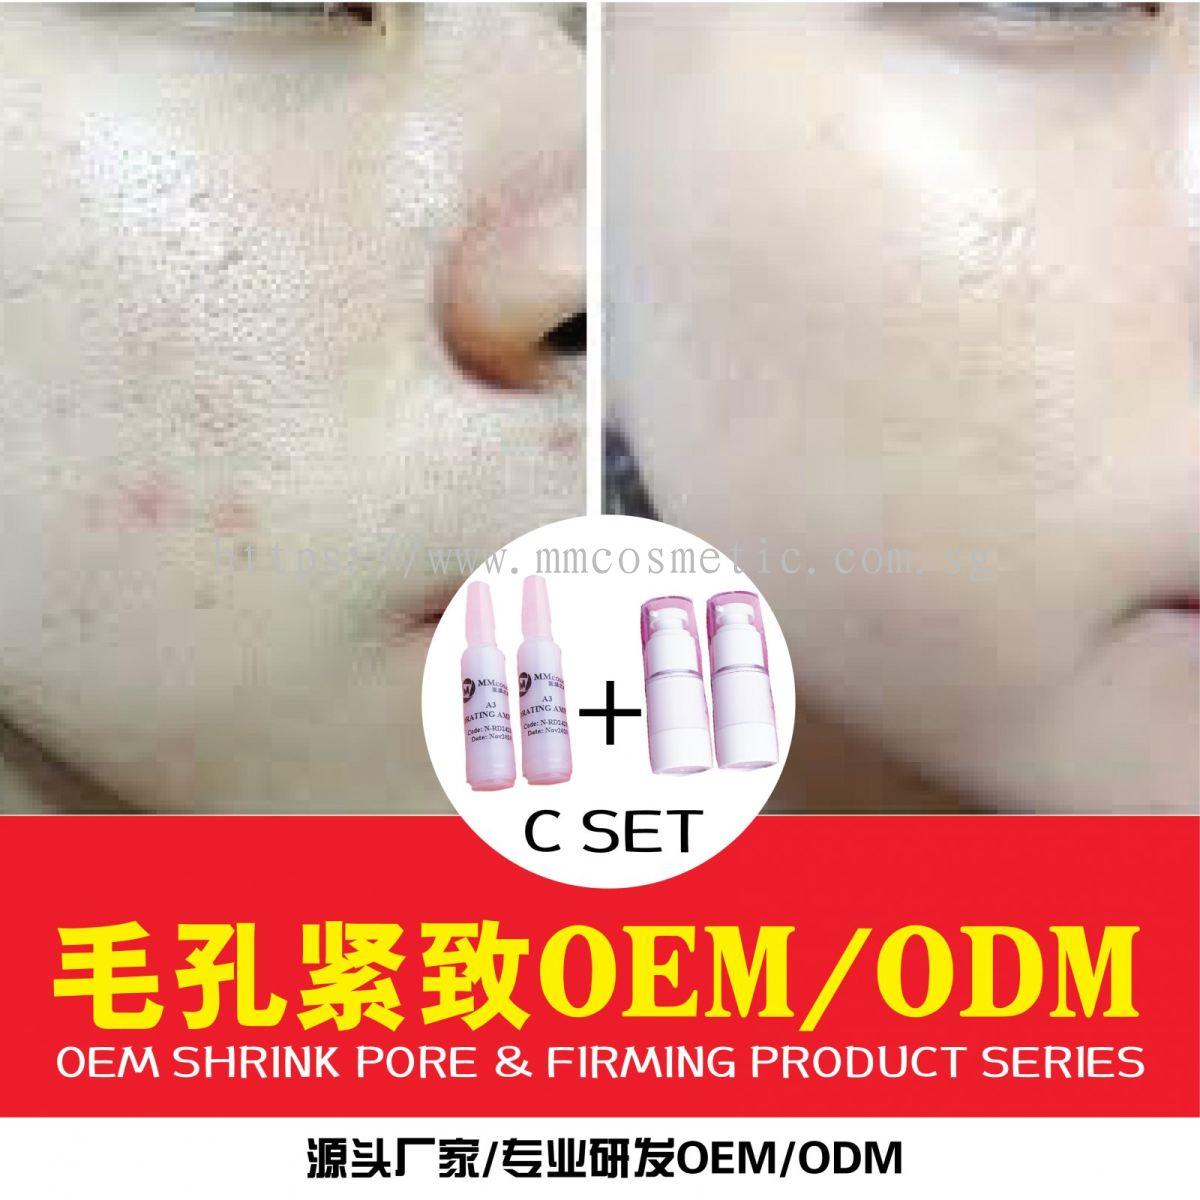 MM COSMETIC SDN BHD:OEM/ODM A+M SET*5组 安瓶+皮肤调理帮助你对抗老化的最佳组合!